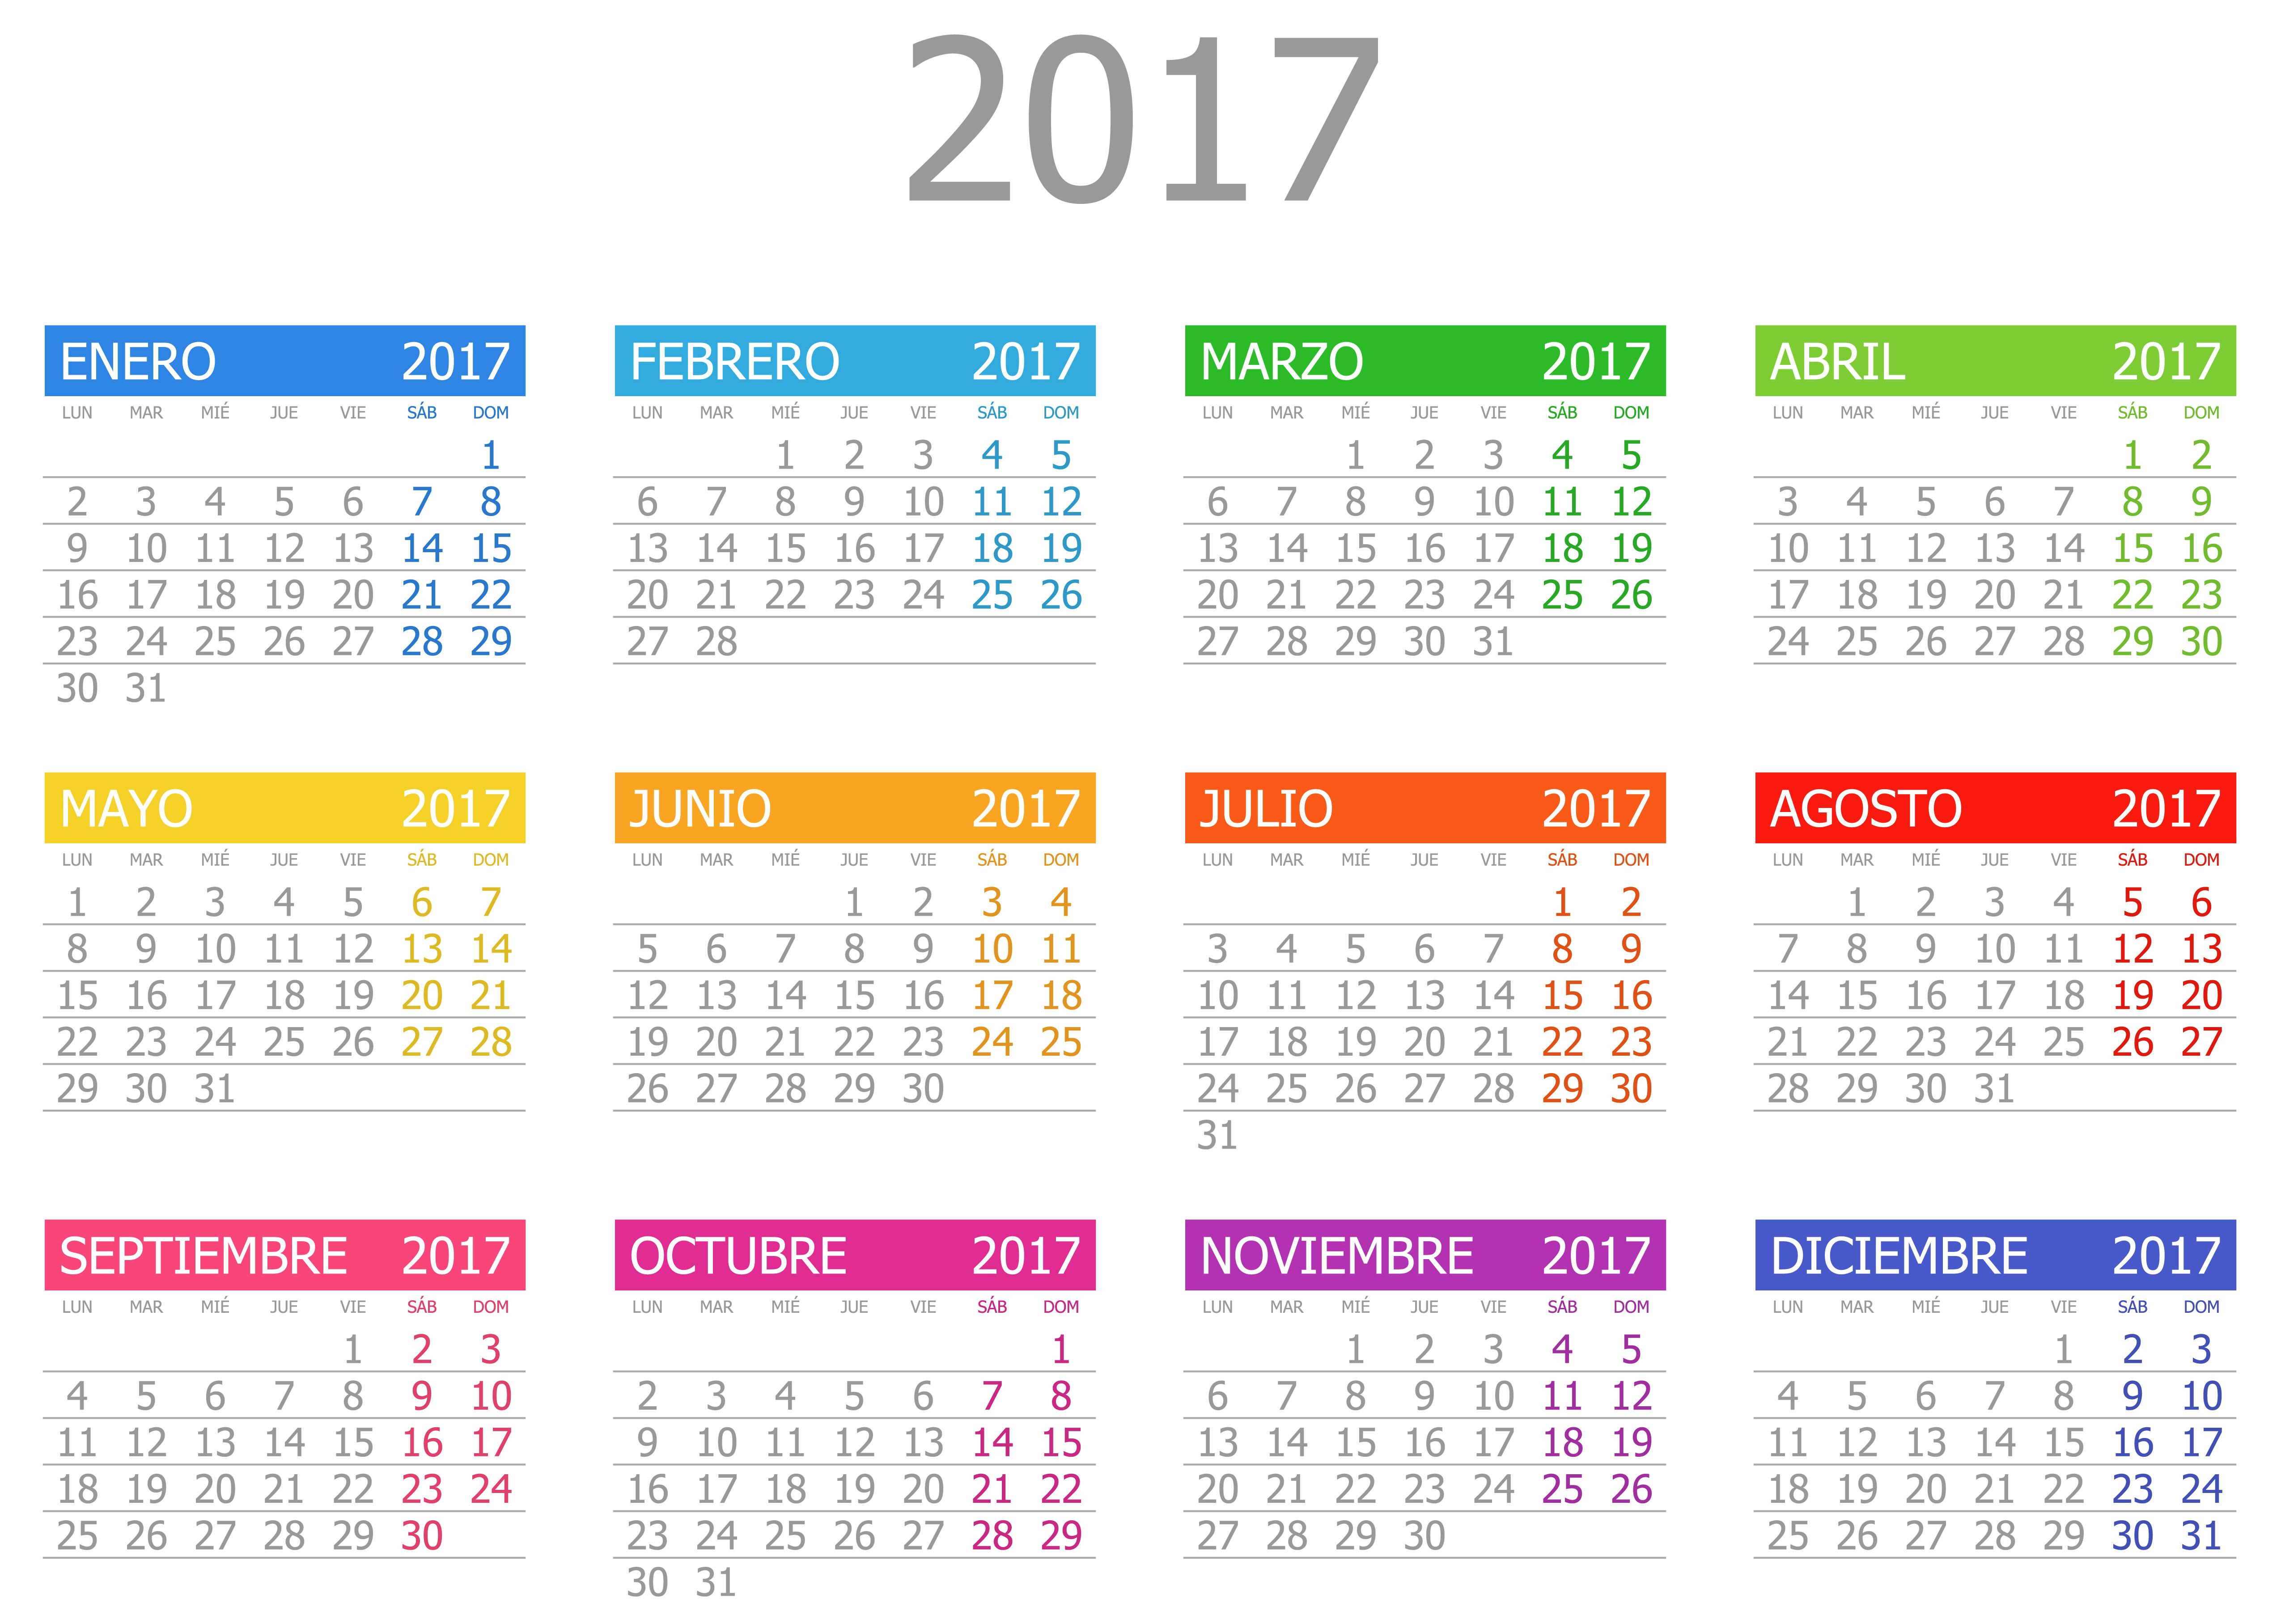 Calendario 2017 on Dibujos Para Imprimir Gratis